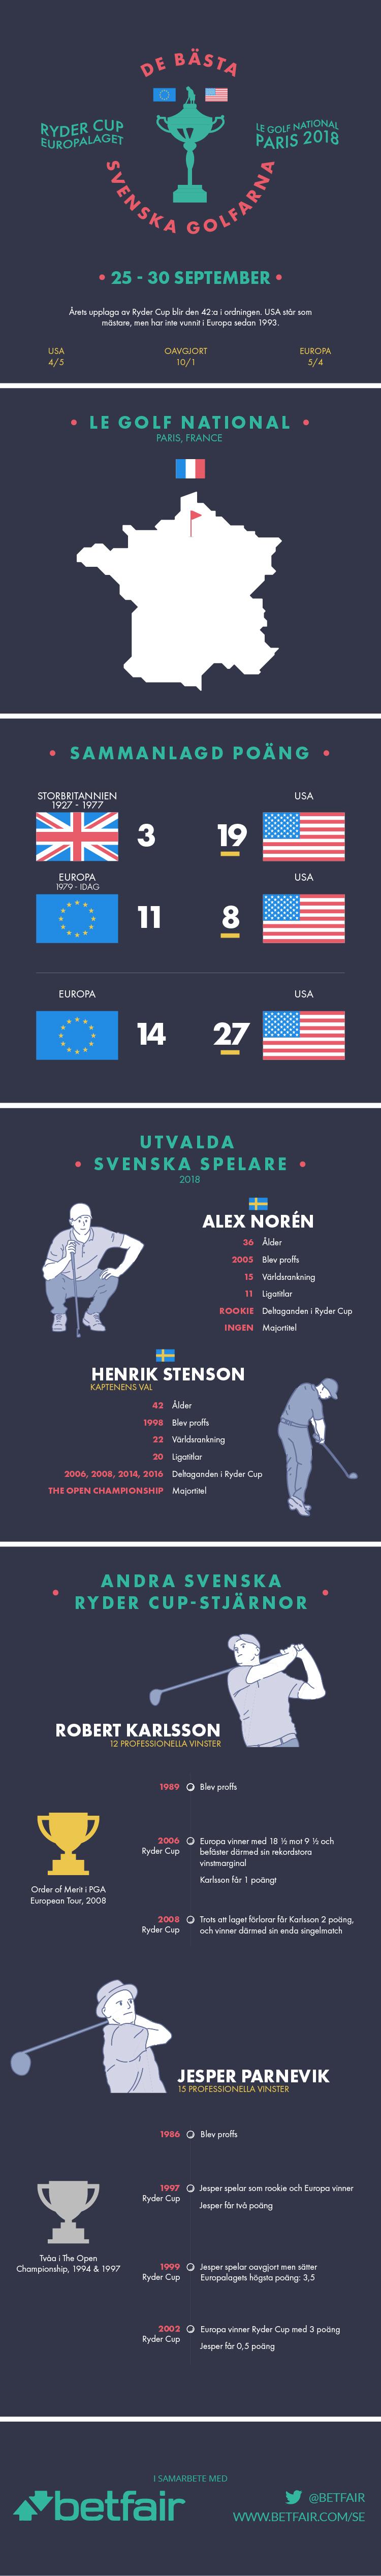 Svenska golfare i Ryder Cup